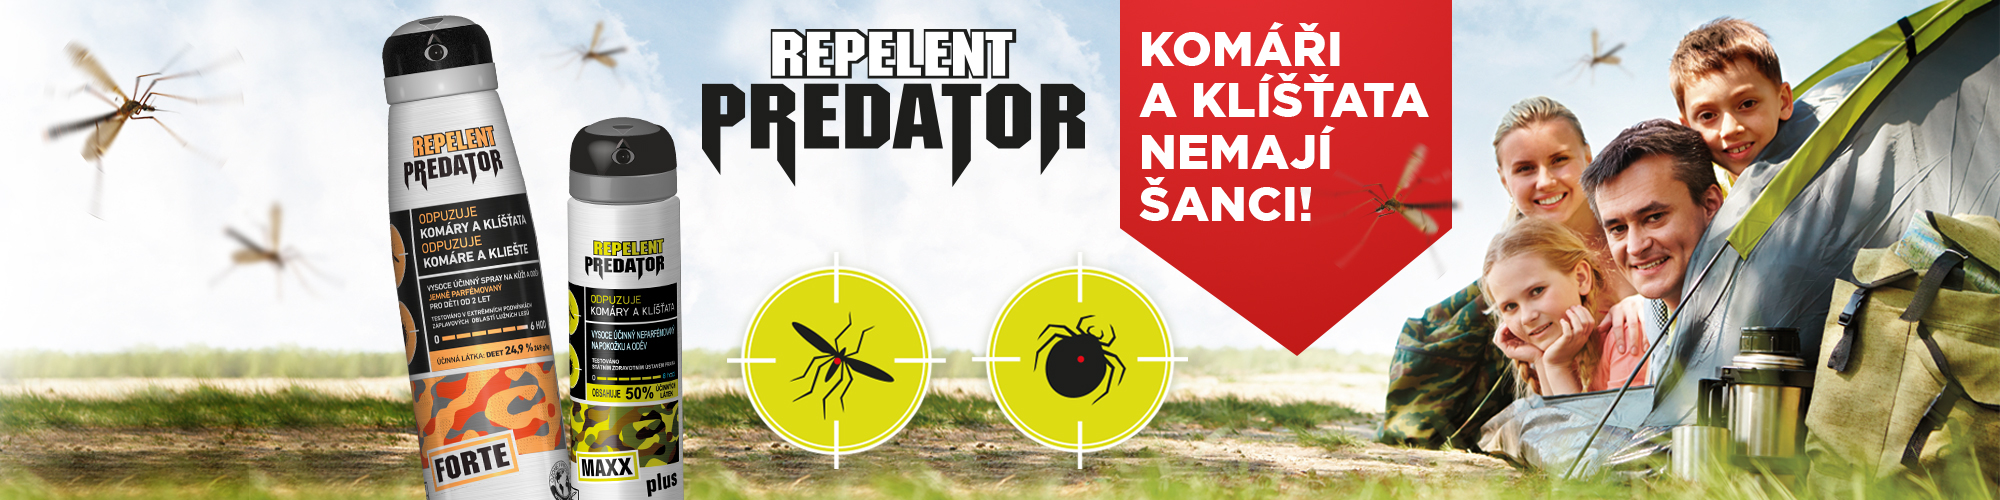 Predator repelenty